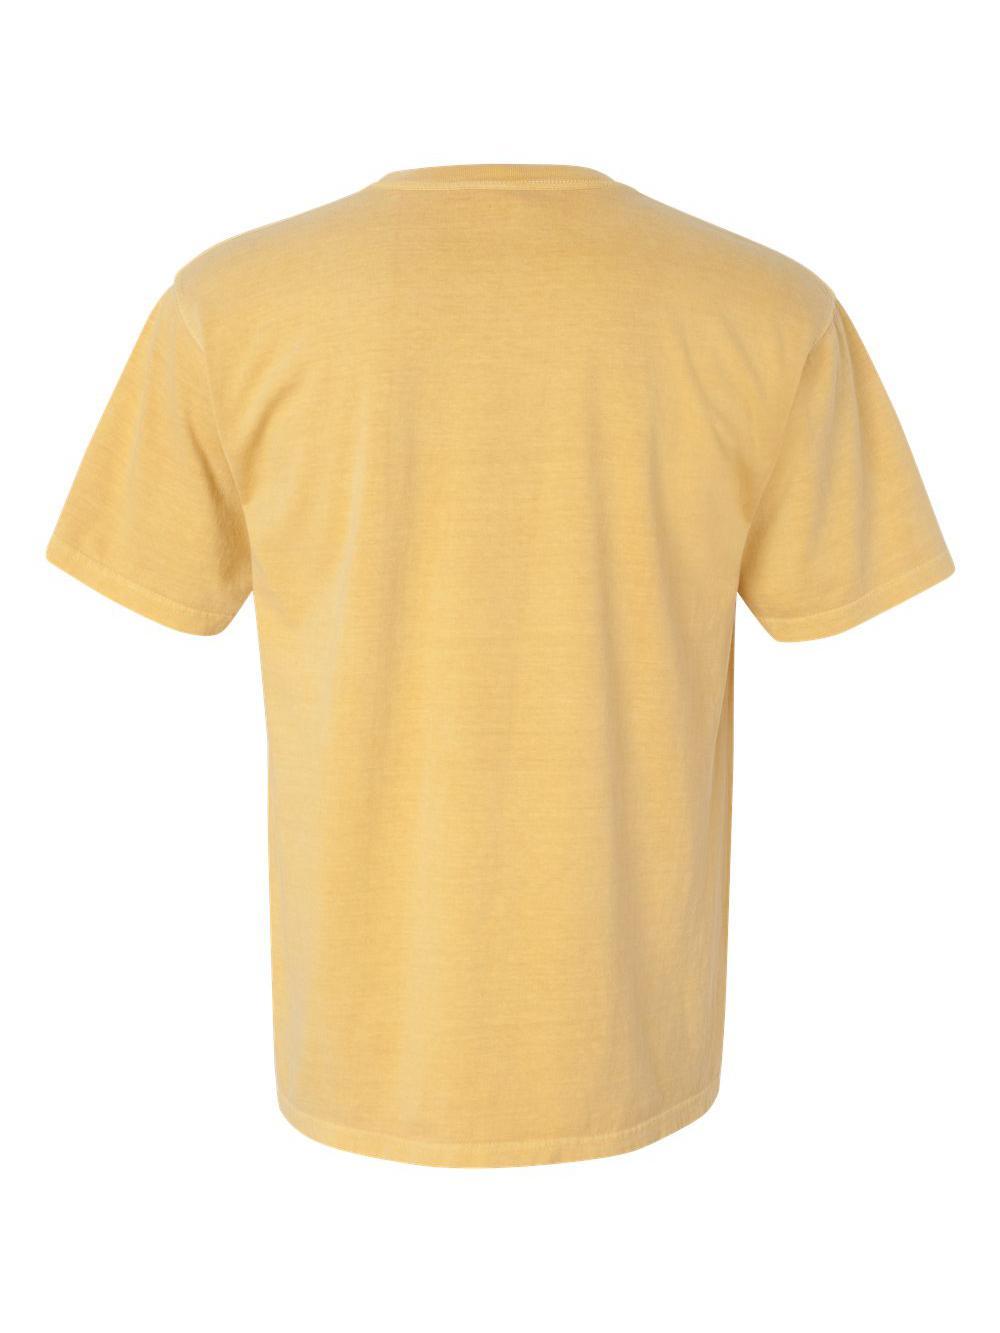 Comfort-Colors-Garment-Dyed-Heavyweight-Ringspun-Short-Sleeve-Shirt-1717 thumbnail 91